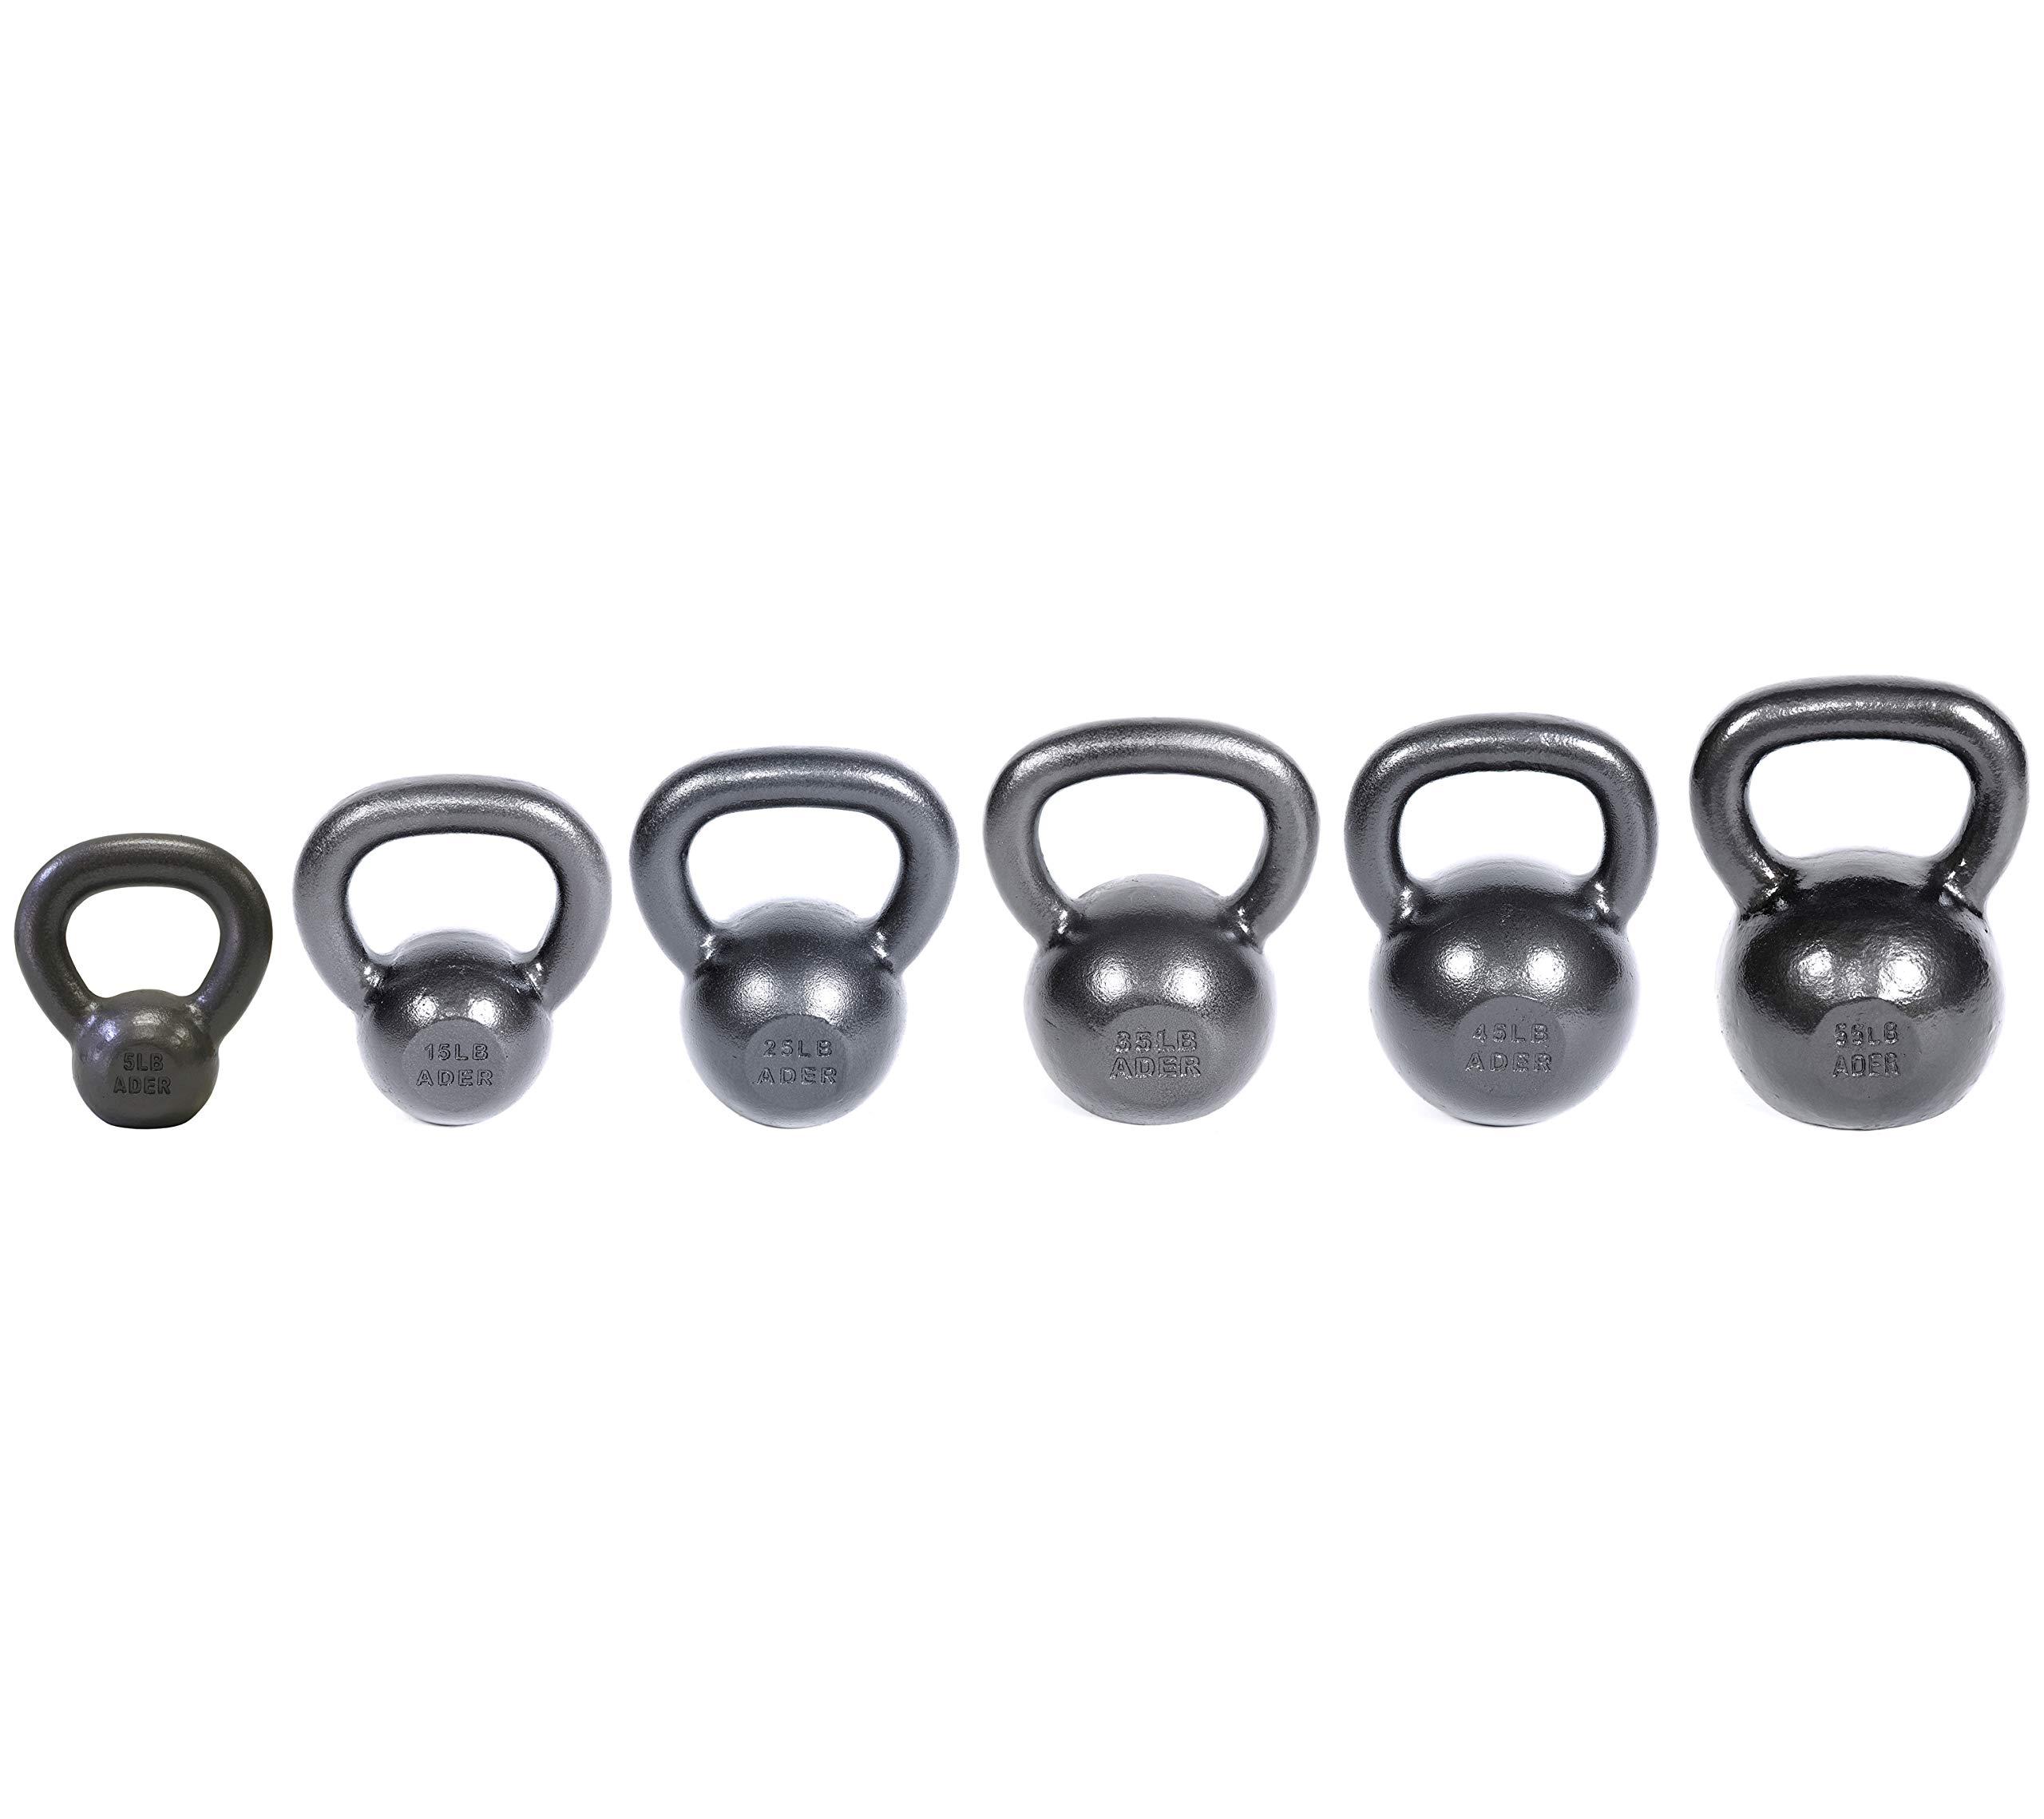 Ader Premier Kettlebell Set (5, 15, 25, 35, 45, 55 Lbs) w/DVD & Gym Chalk Ball